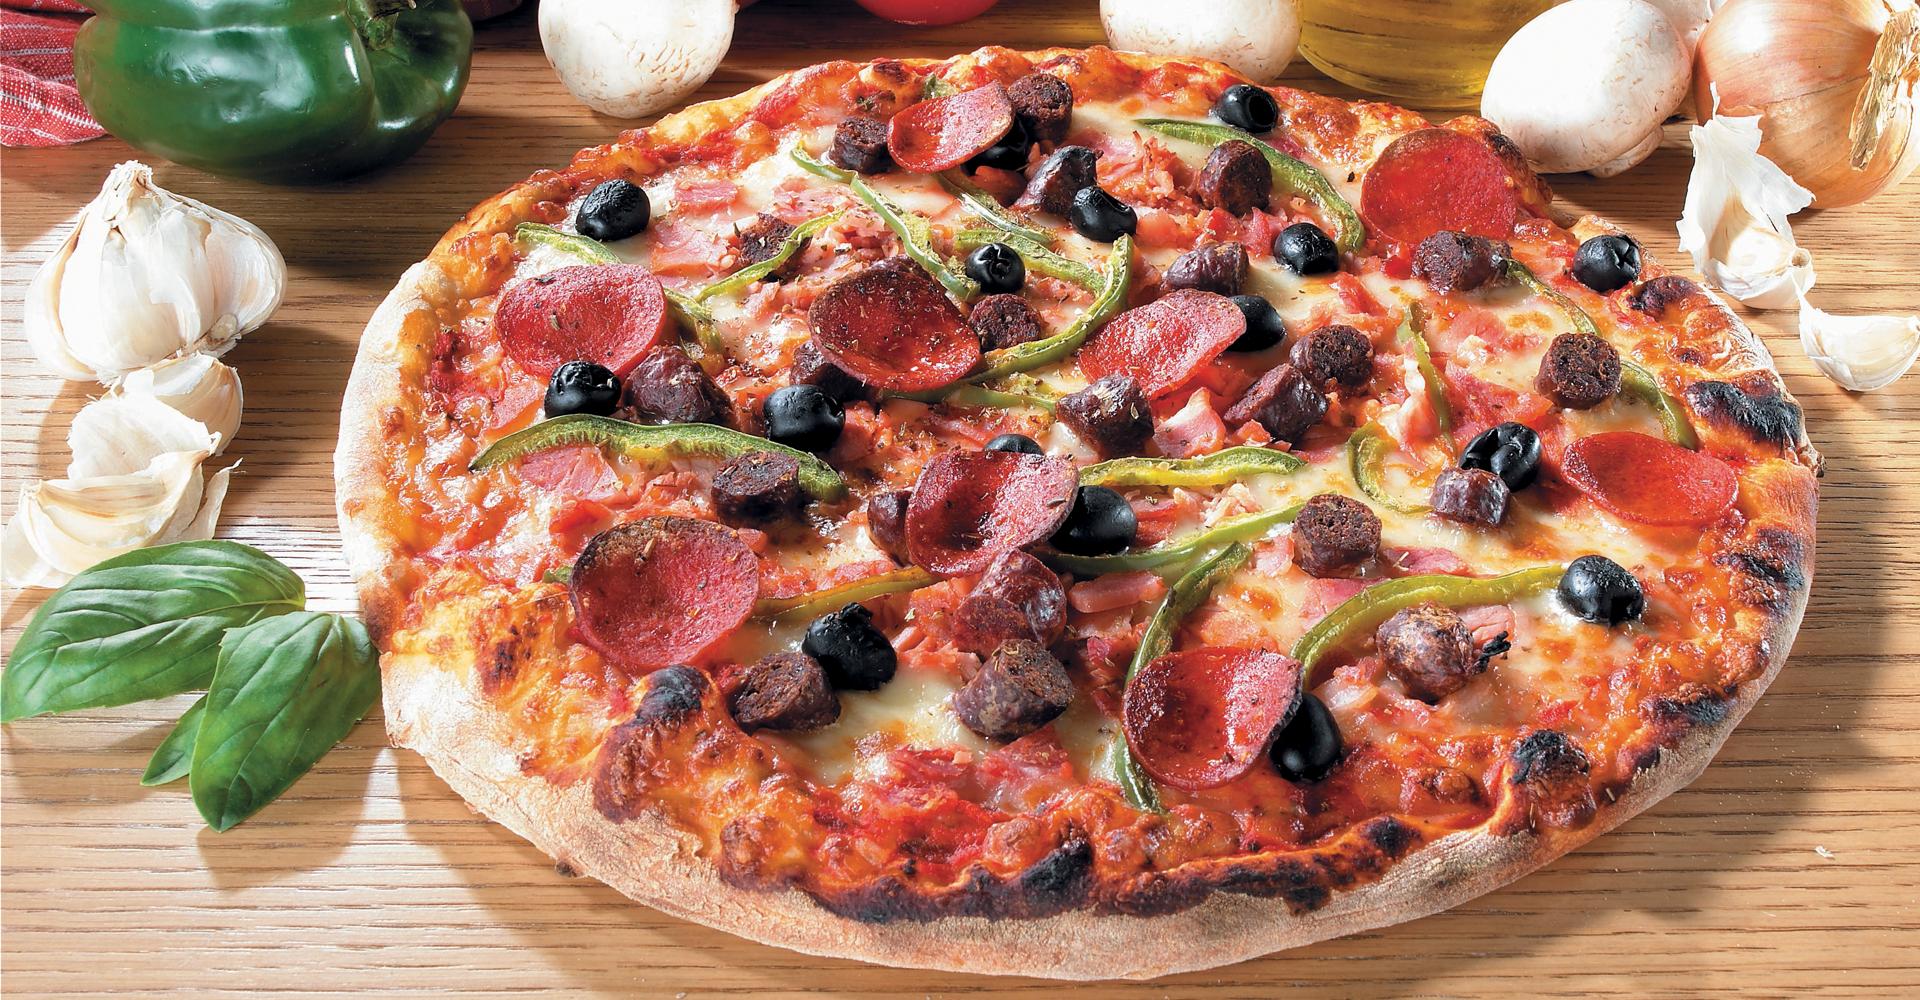 Bienvenue à La Pizzetta